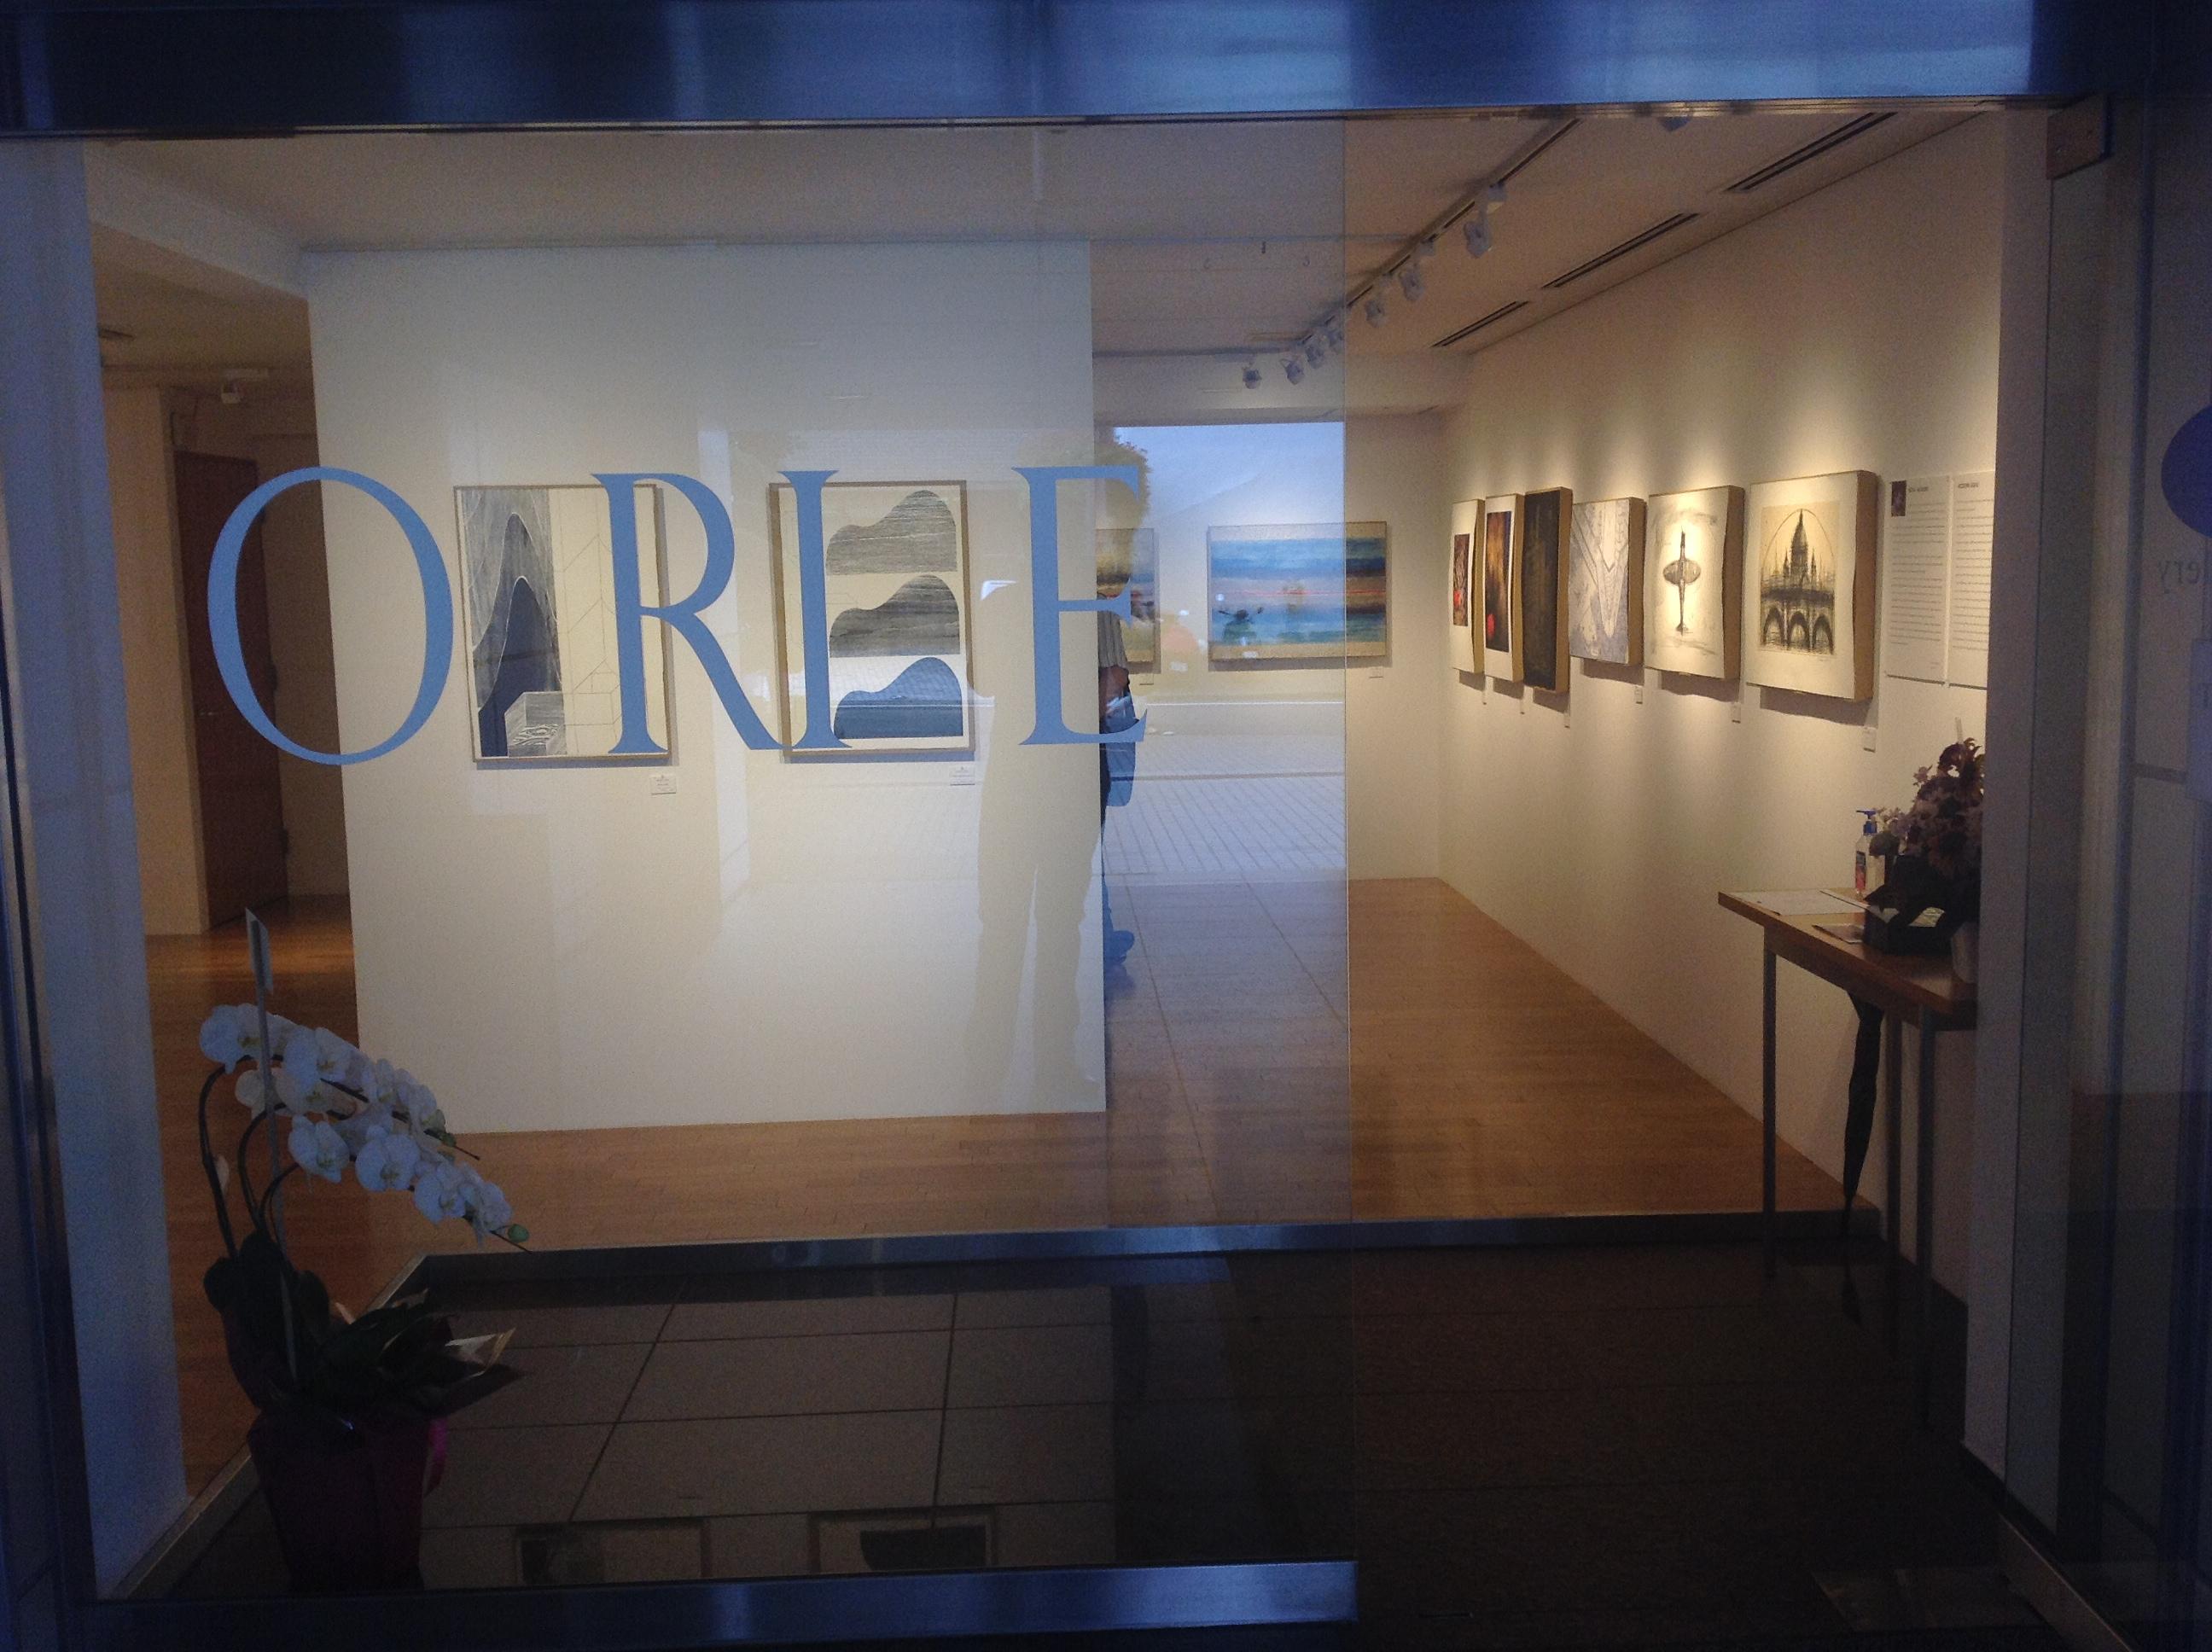 SEGNI MODERNI イタリアの現代版画展 - O RI E Art Gallery di Tokyo